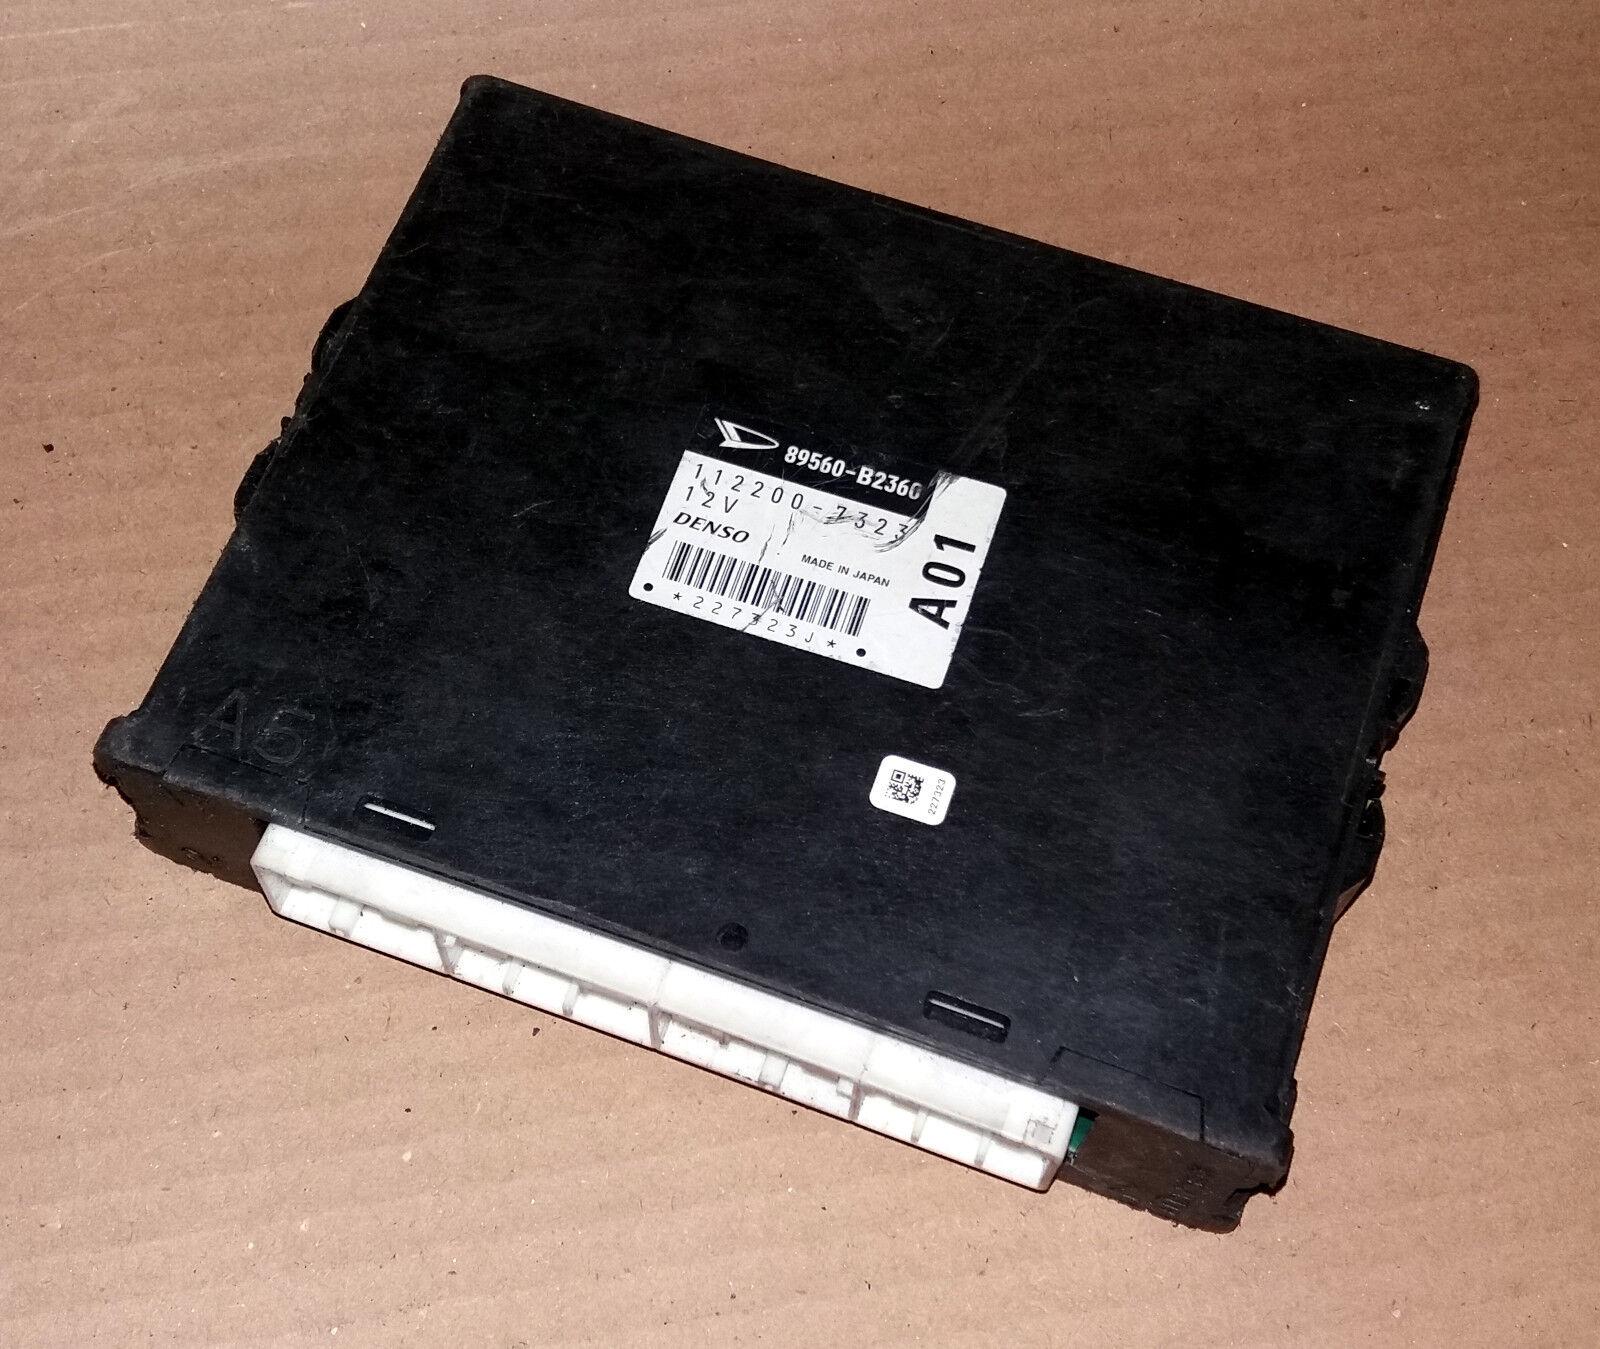 Used Daihatsu Engine Computers For Sale Page 2 Ecu Wiring Diagram Move 2003 Ua L150s 89560 B2360 Ecm Oem Jdm 112200 7323 A01